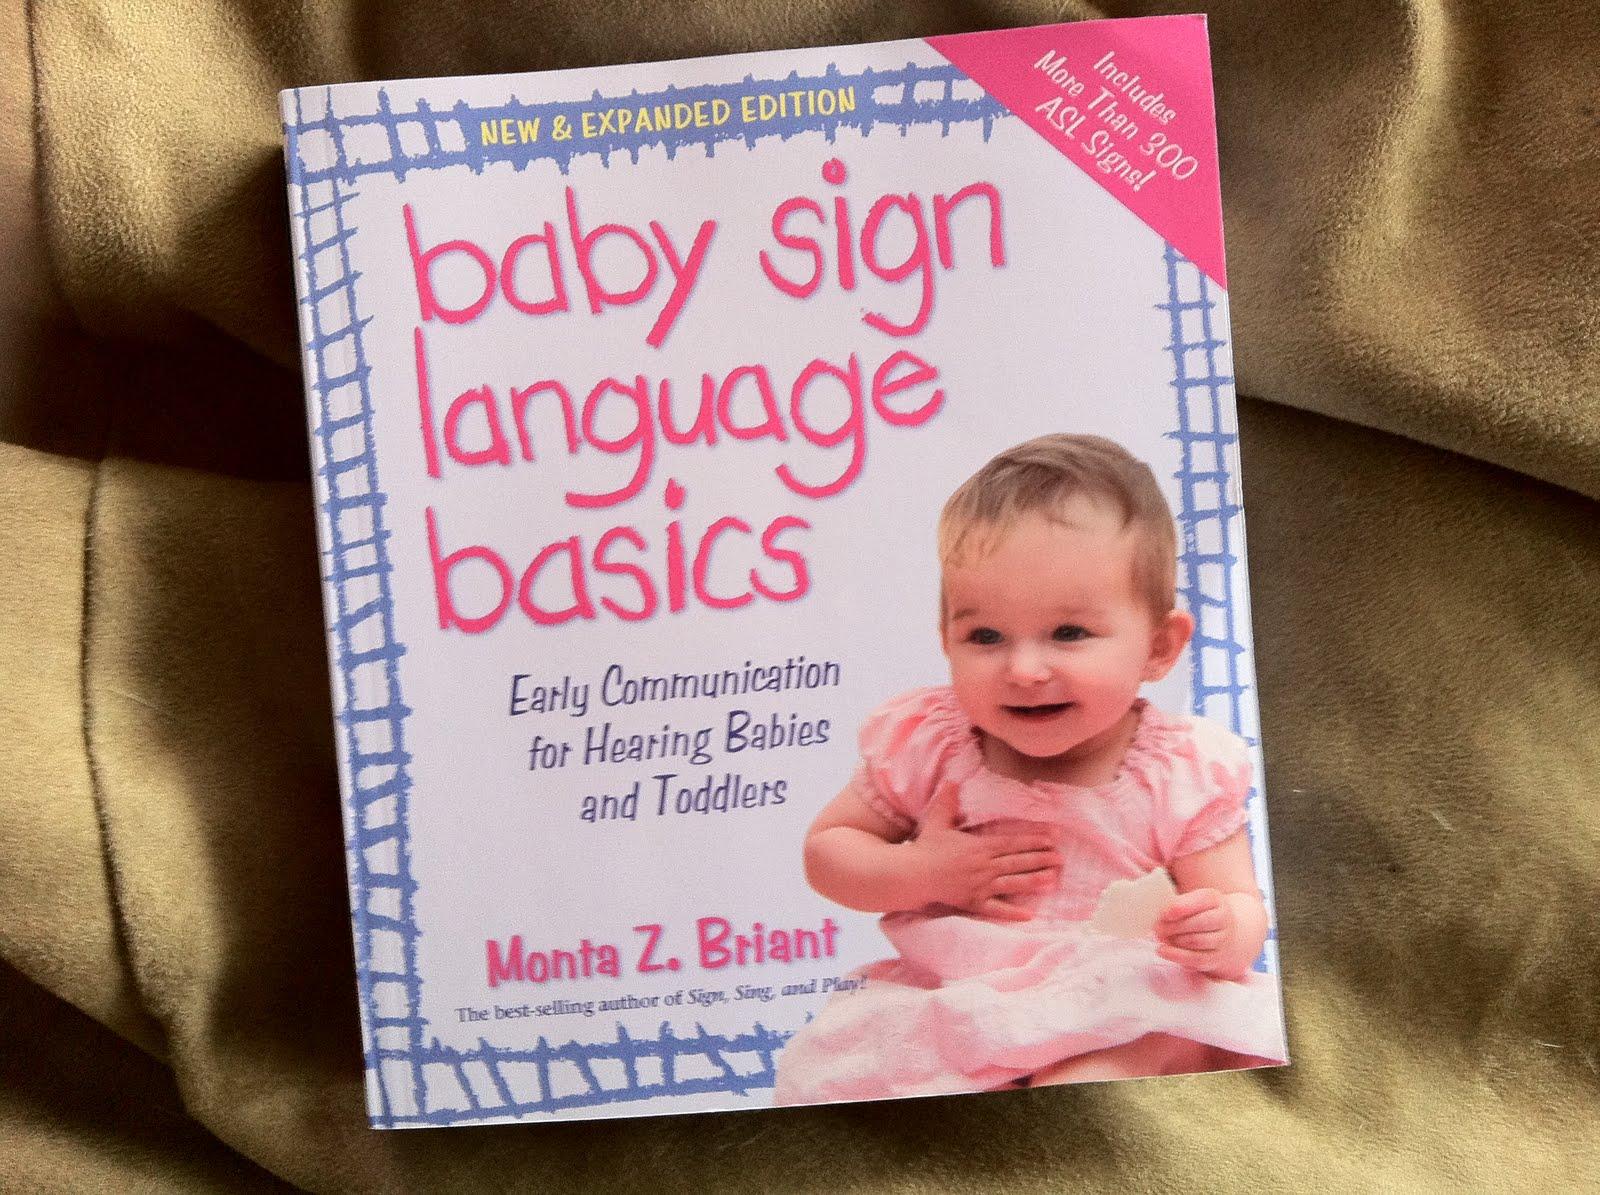 Lisa Rtgit Com Baby Sign Language Basics Arrived